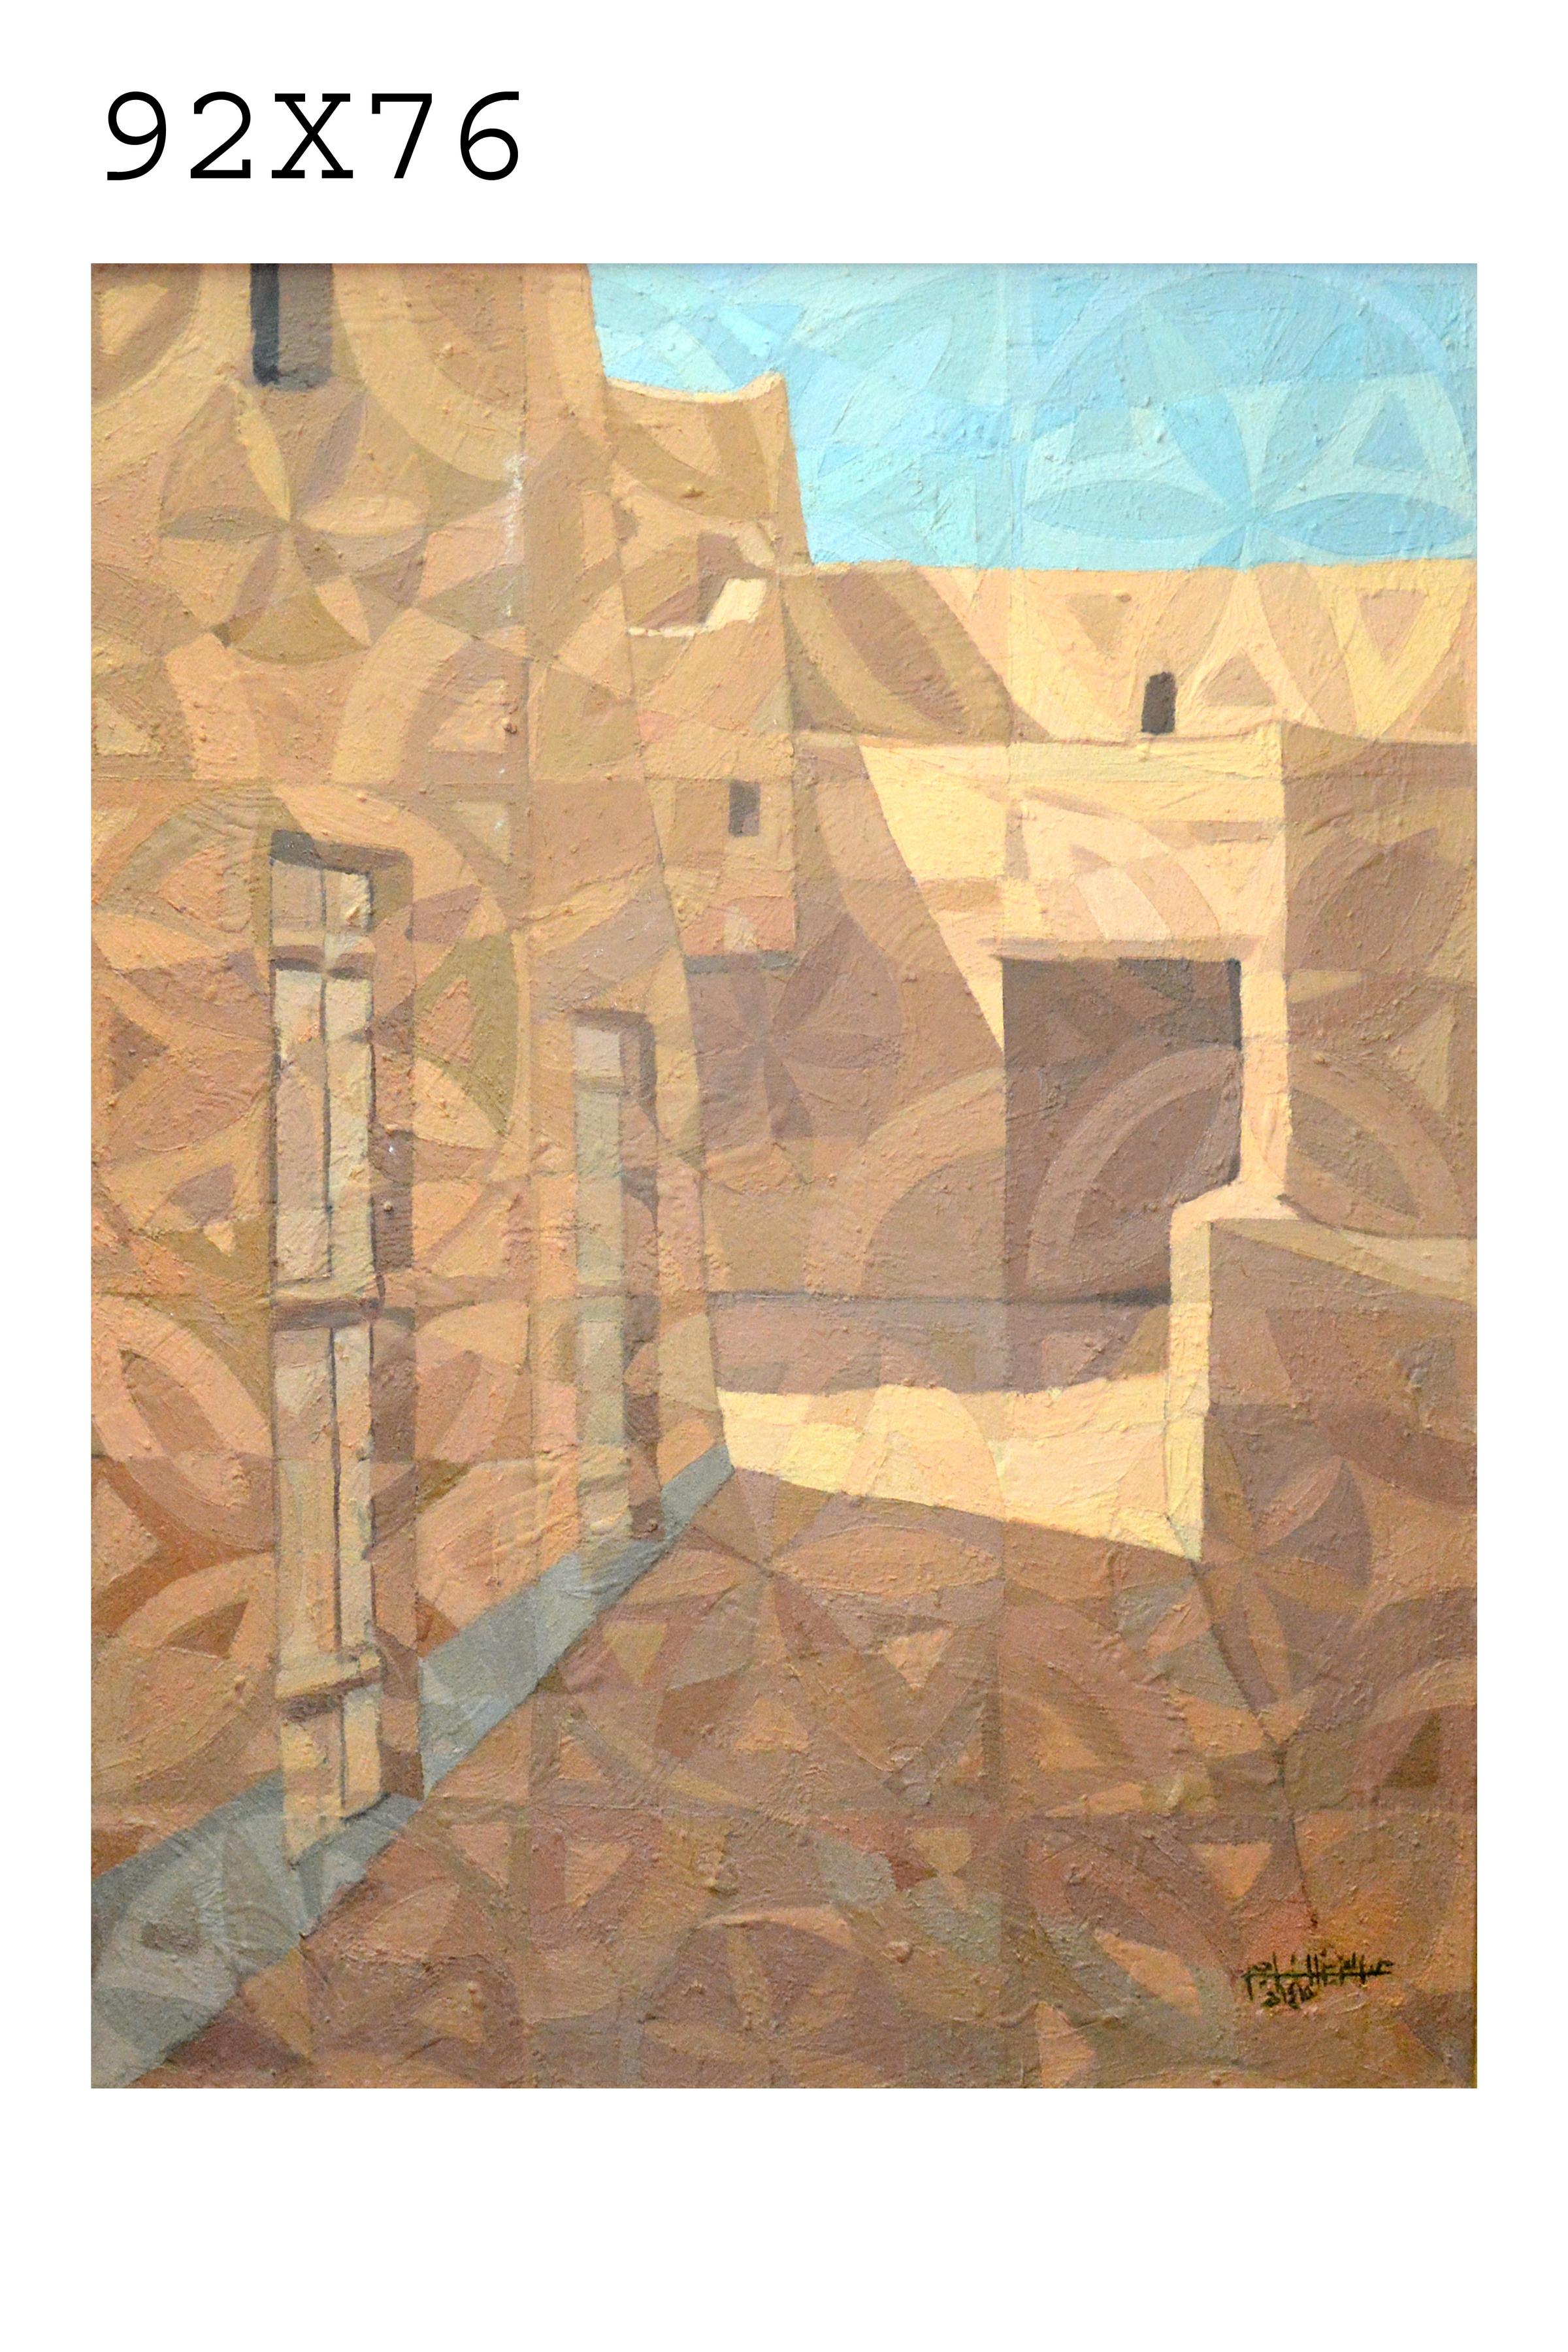 114_193 - Artist Abdul Aziz Al Najjim 92 in 76 oil on canvas - الفنان عبد العزيز الناجم.JPG